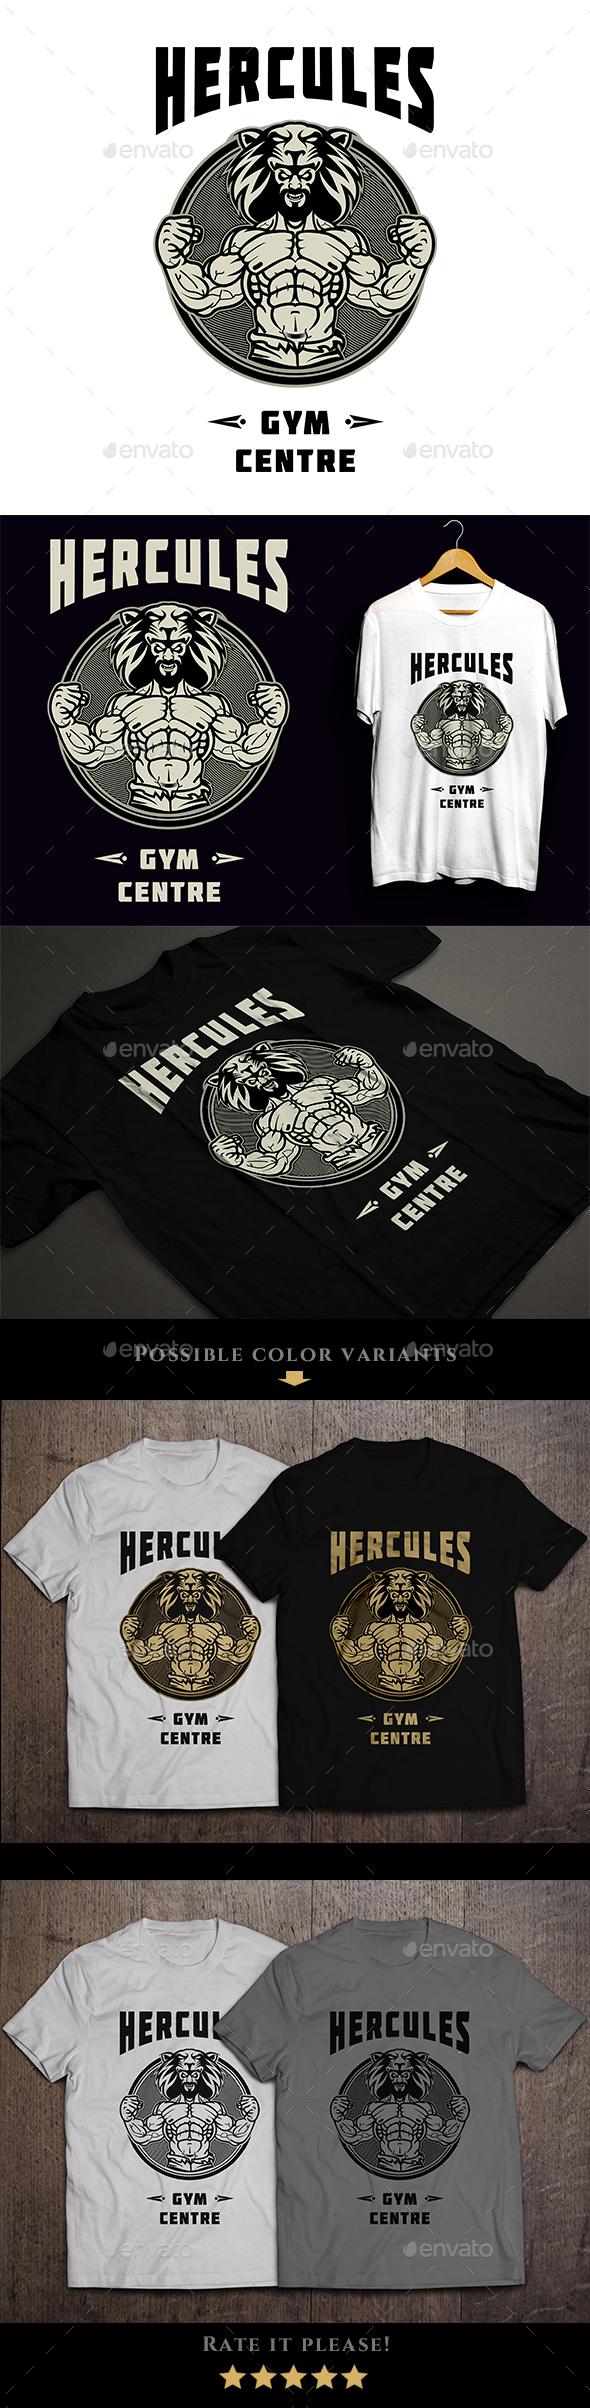 Hercules Gym T-shirt - Sports & Teams T-Shirts